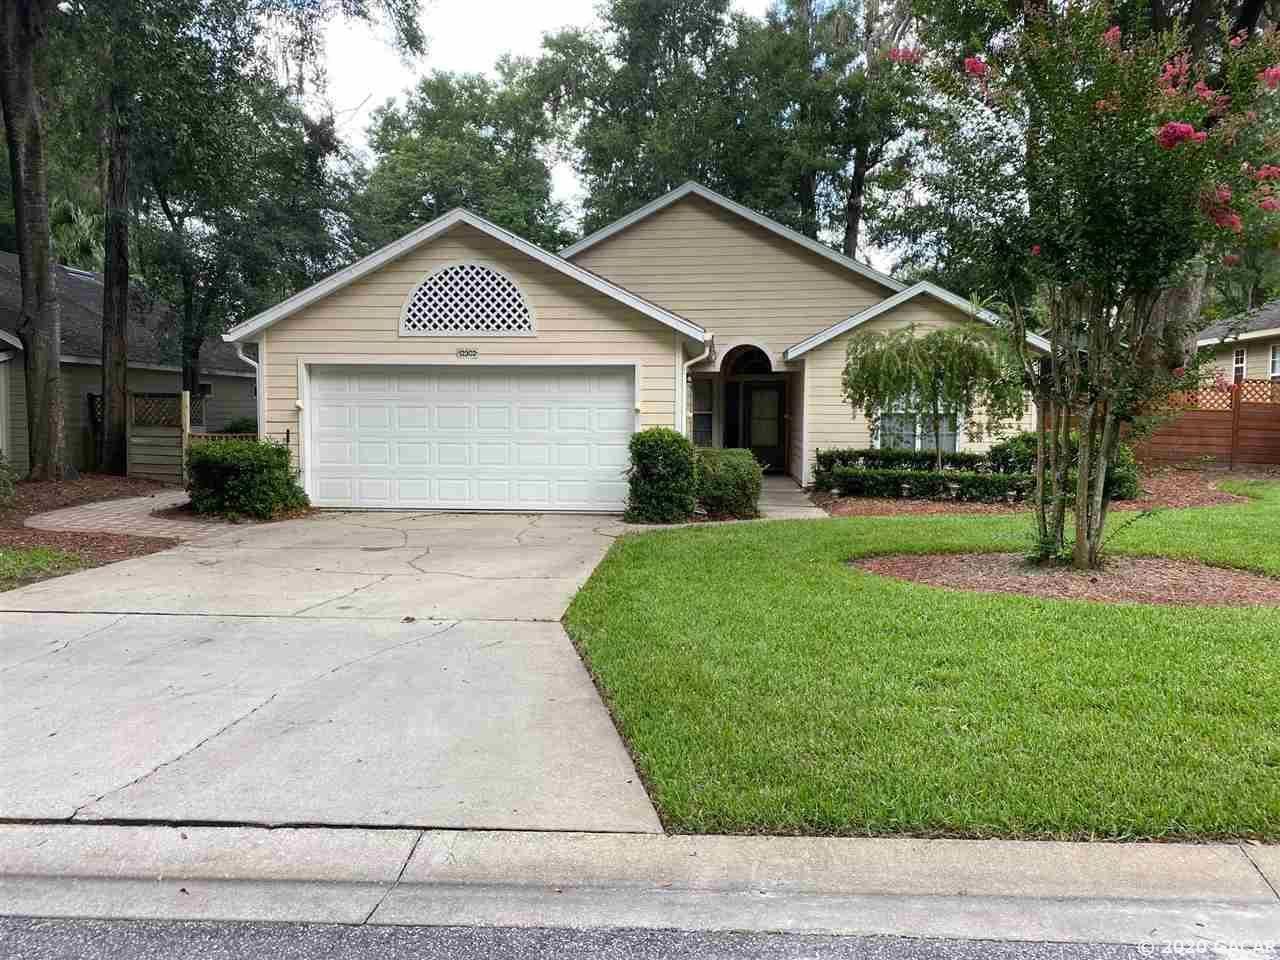 12302 NW 7th Lane, Newberry, FL 32669 - #: 436689